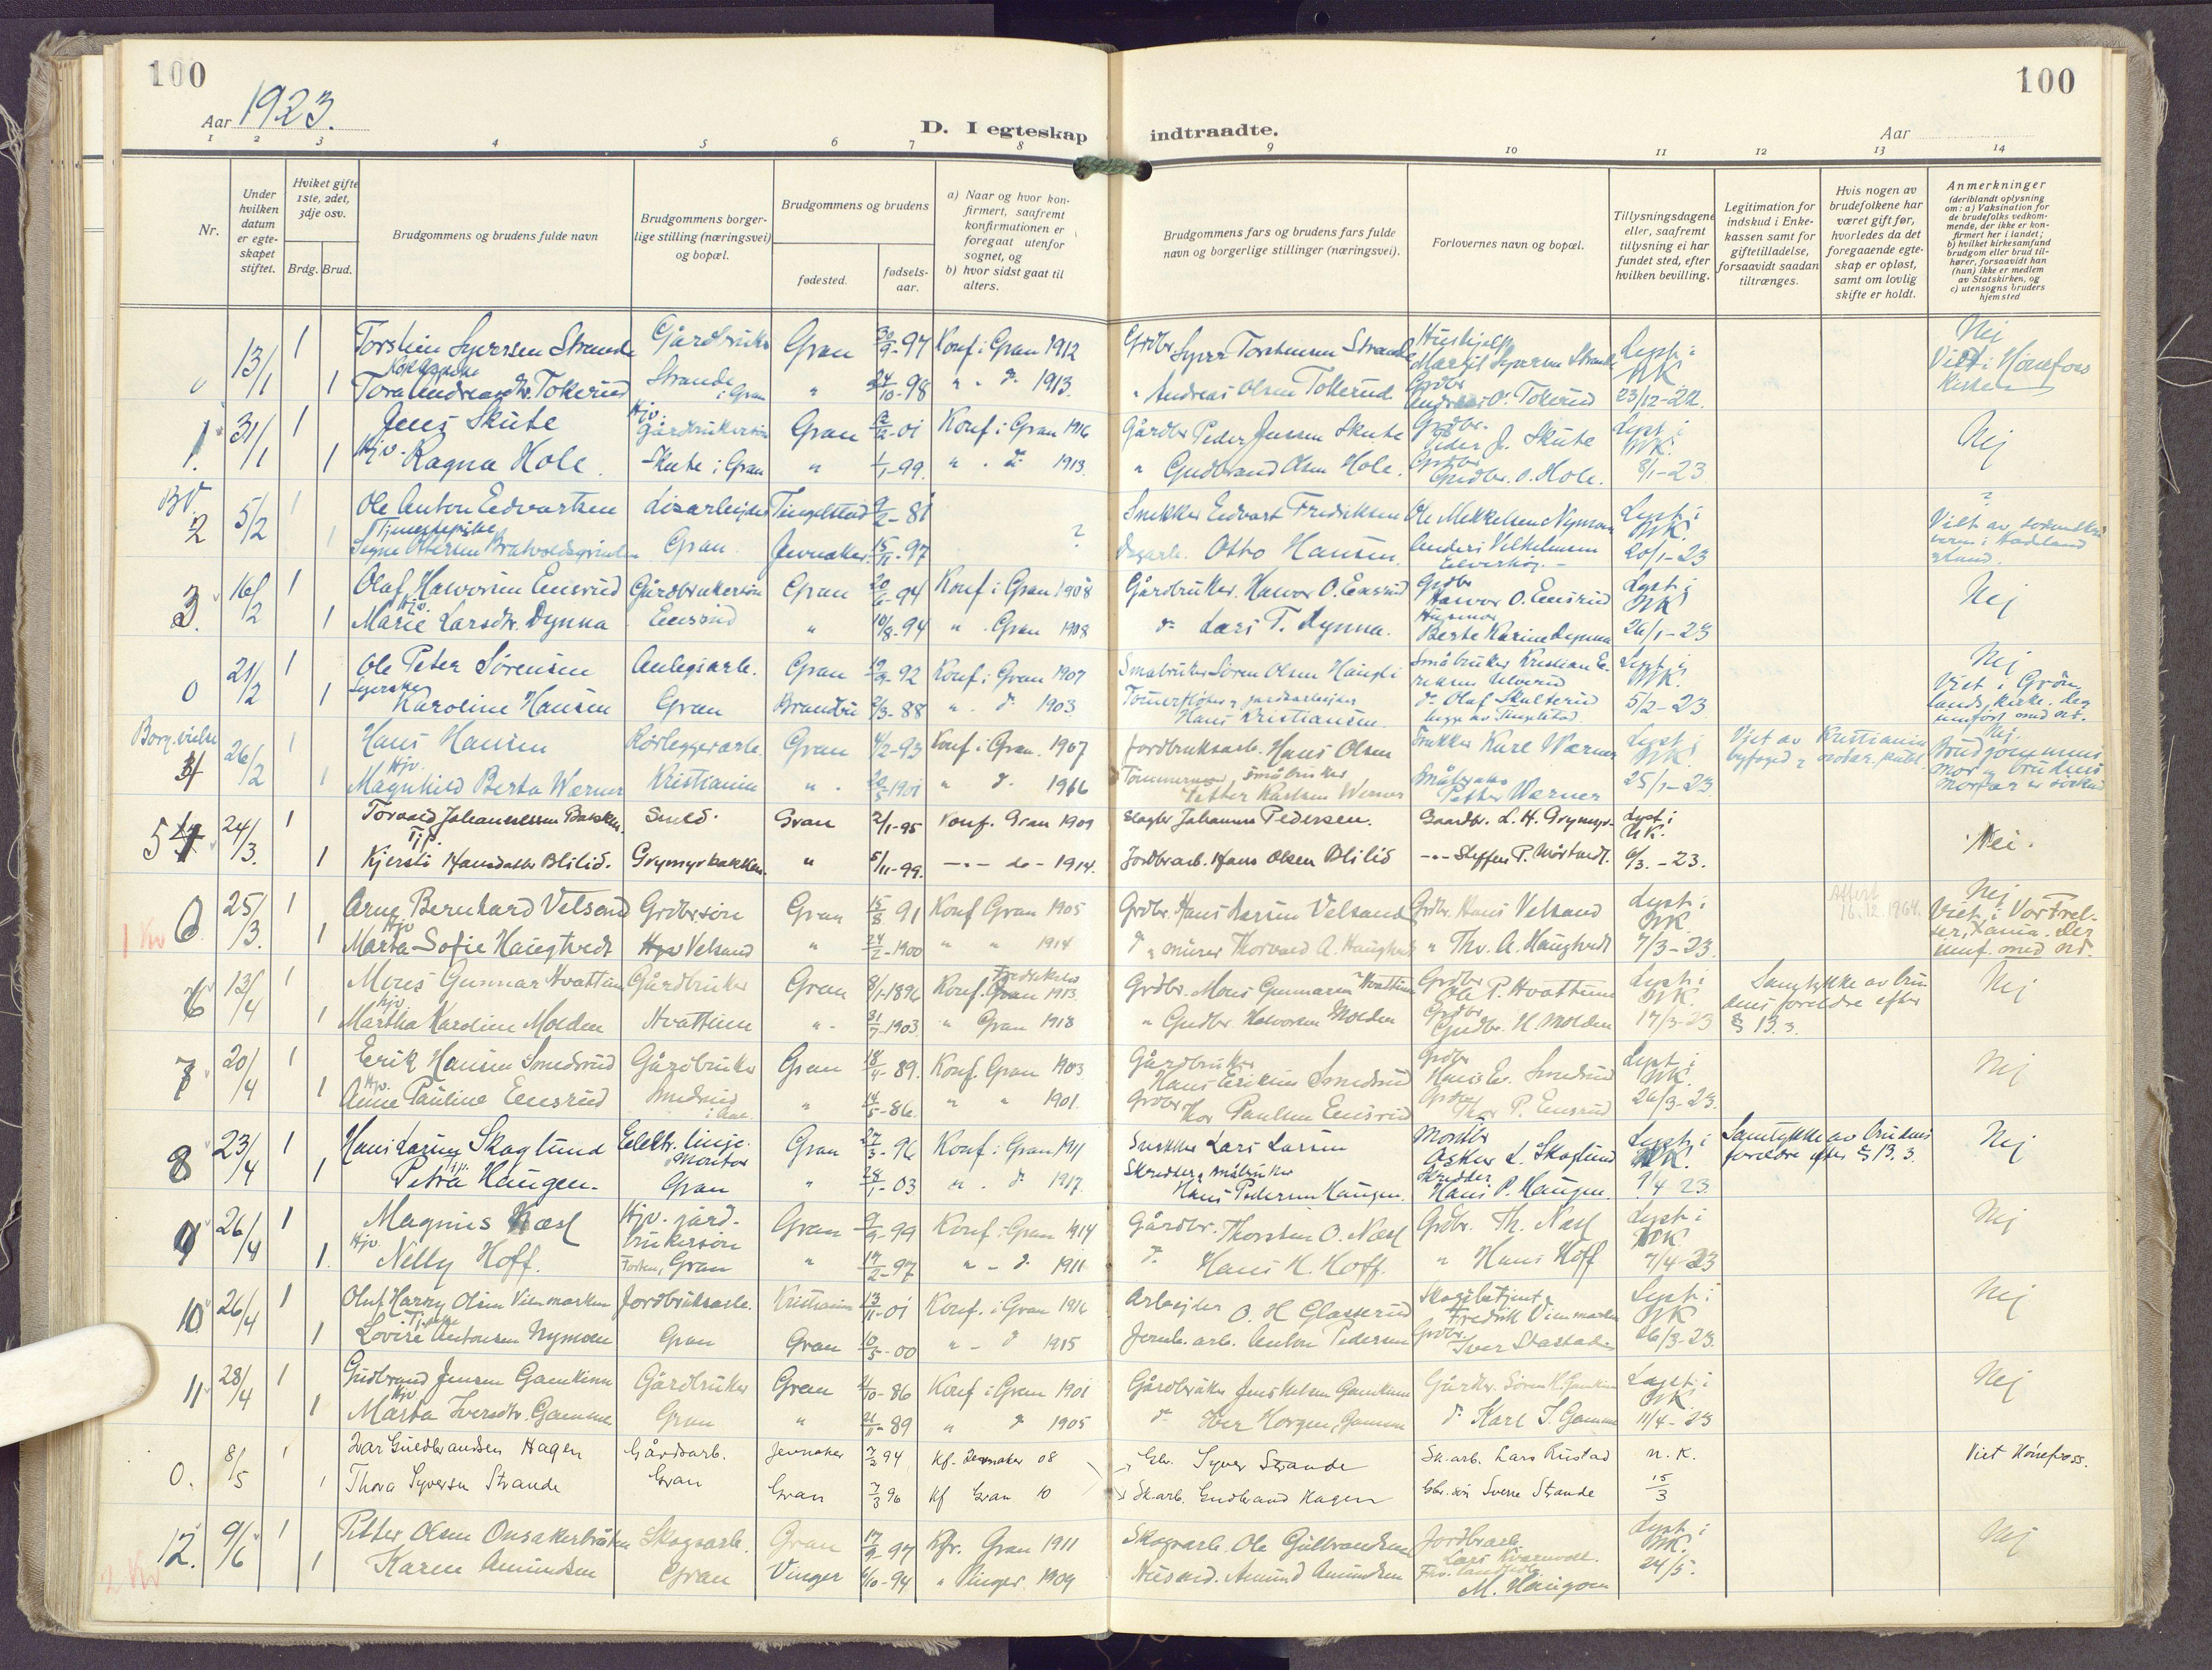 SAH, Gran prestekontor, Ministerialbok nr. 23, 1919-1938, s. 100